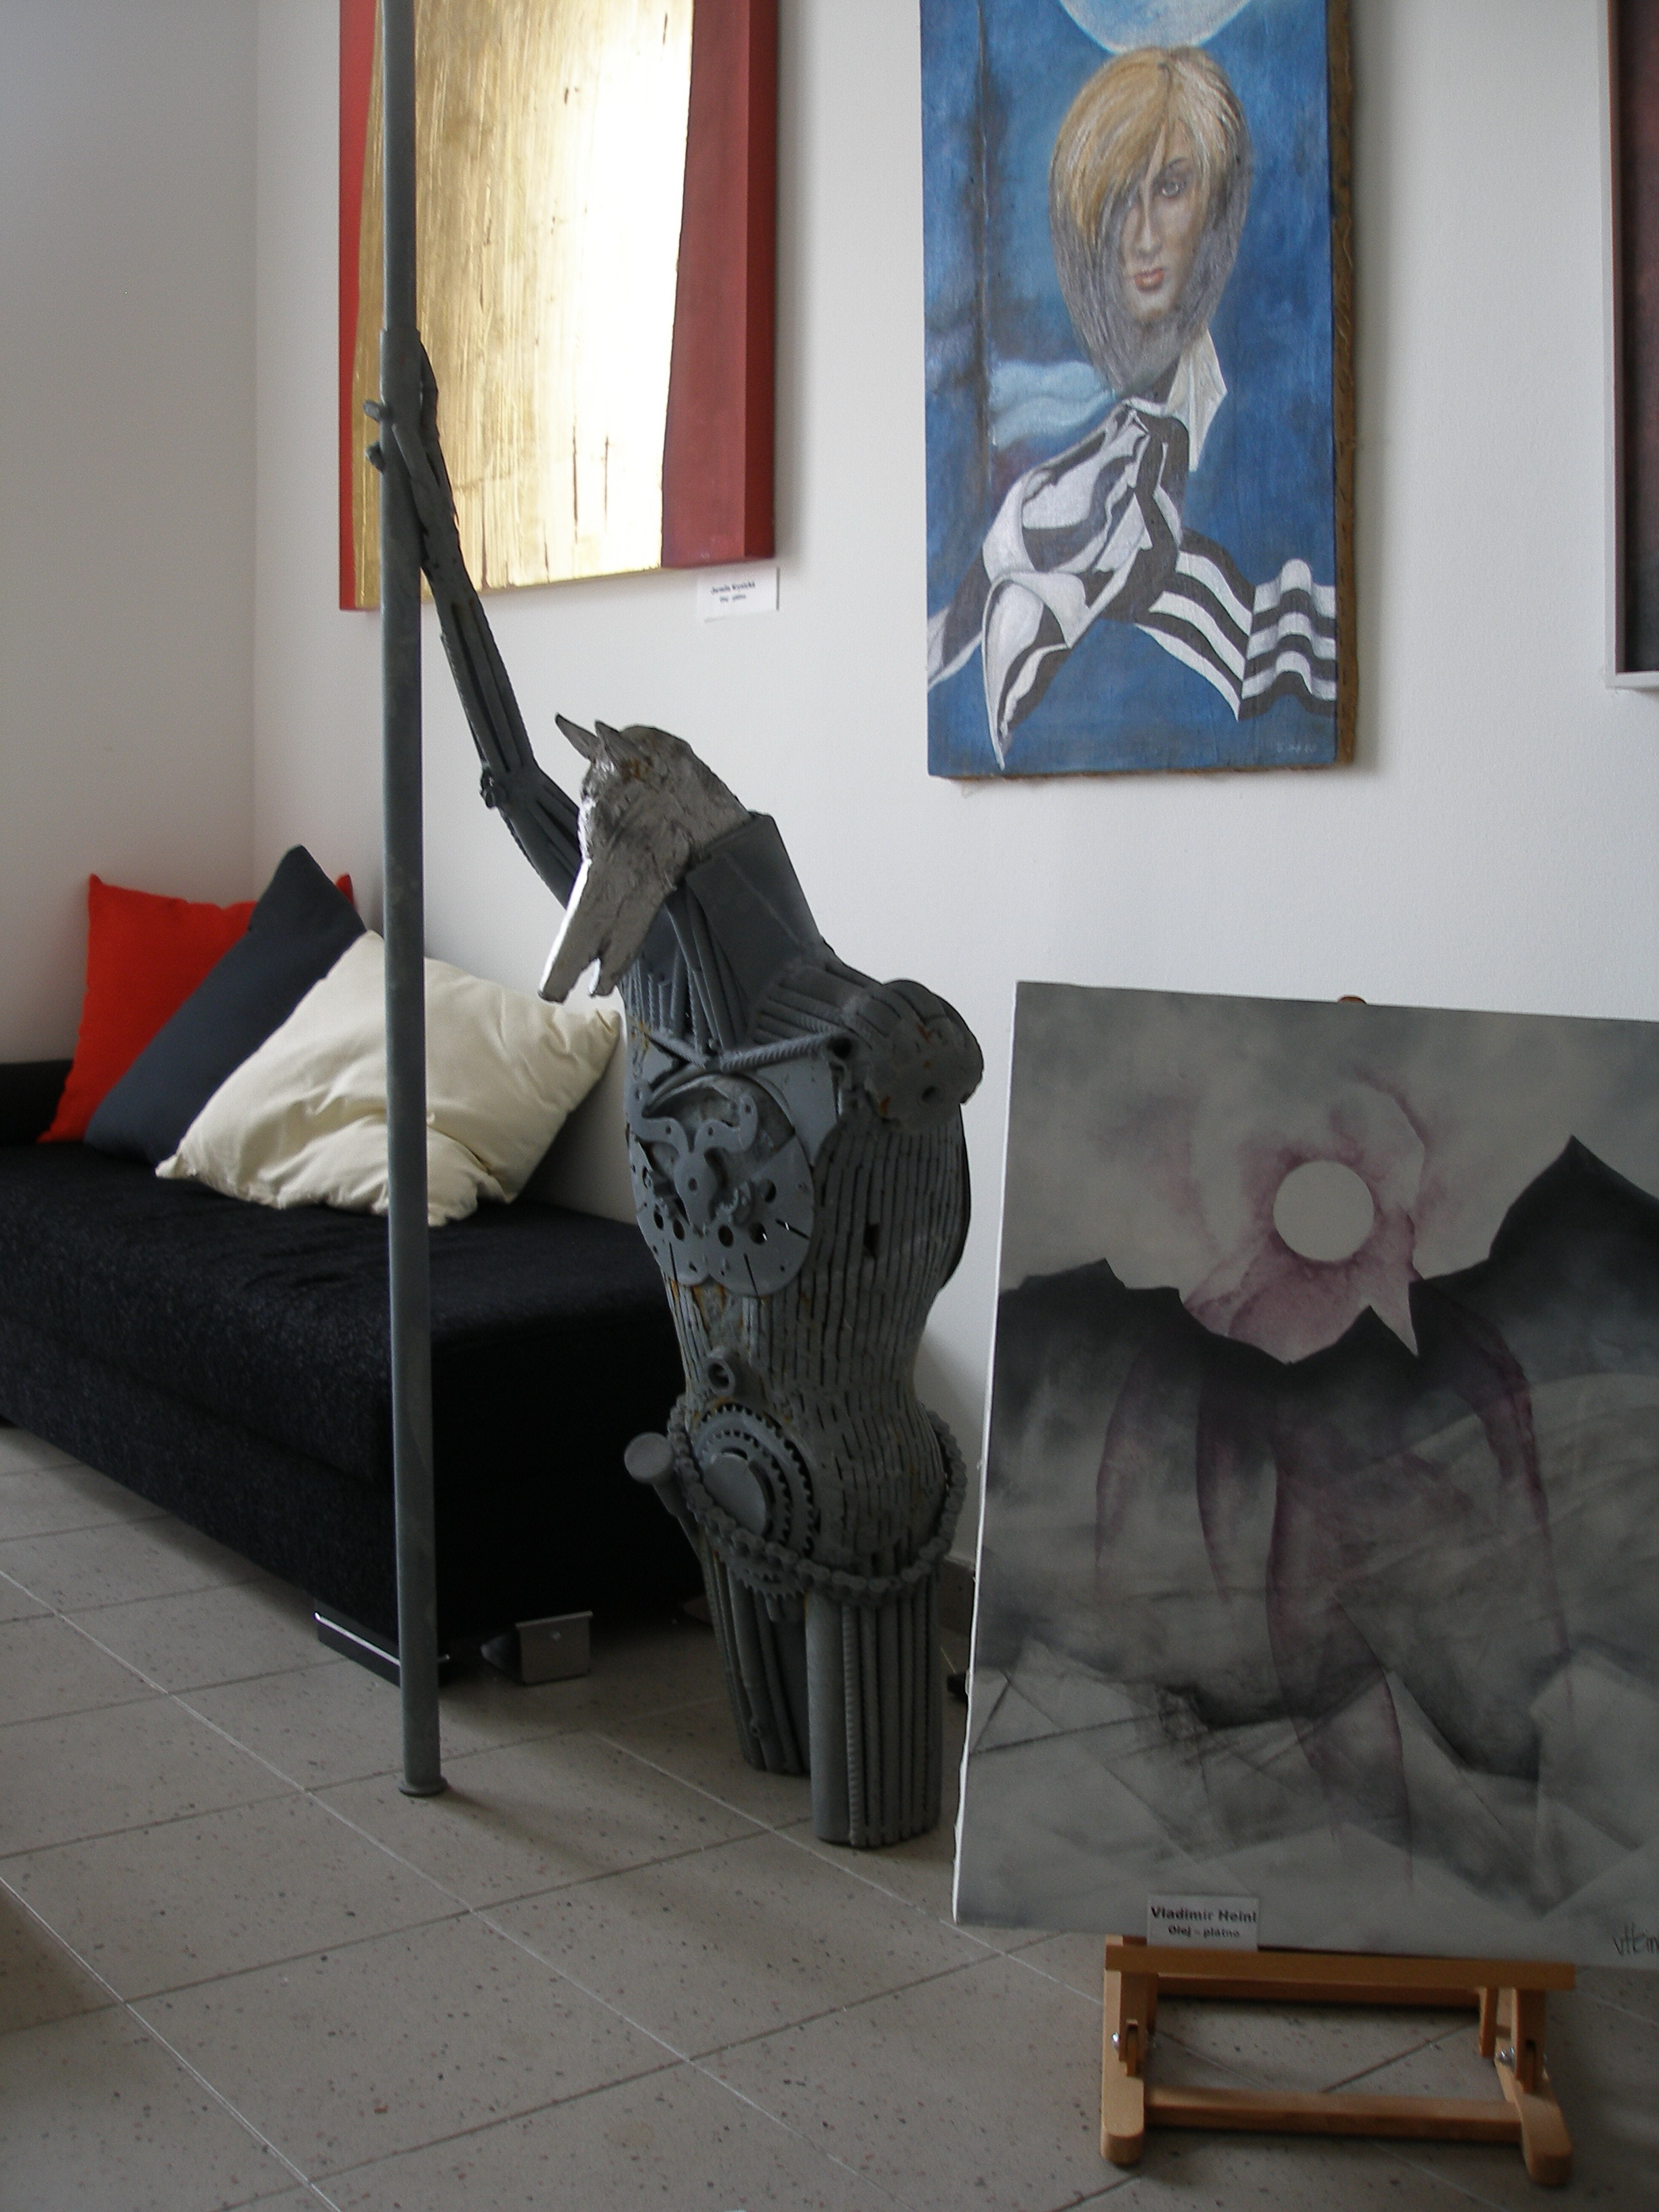 Vybavení interiéru - obrazy, originální design interiéru